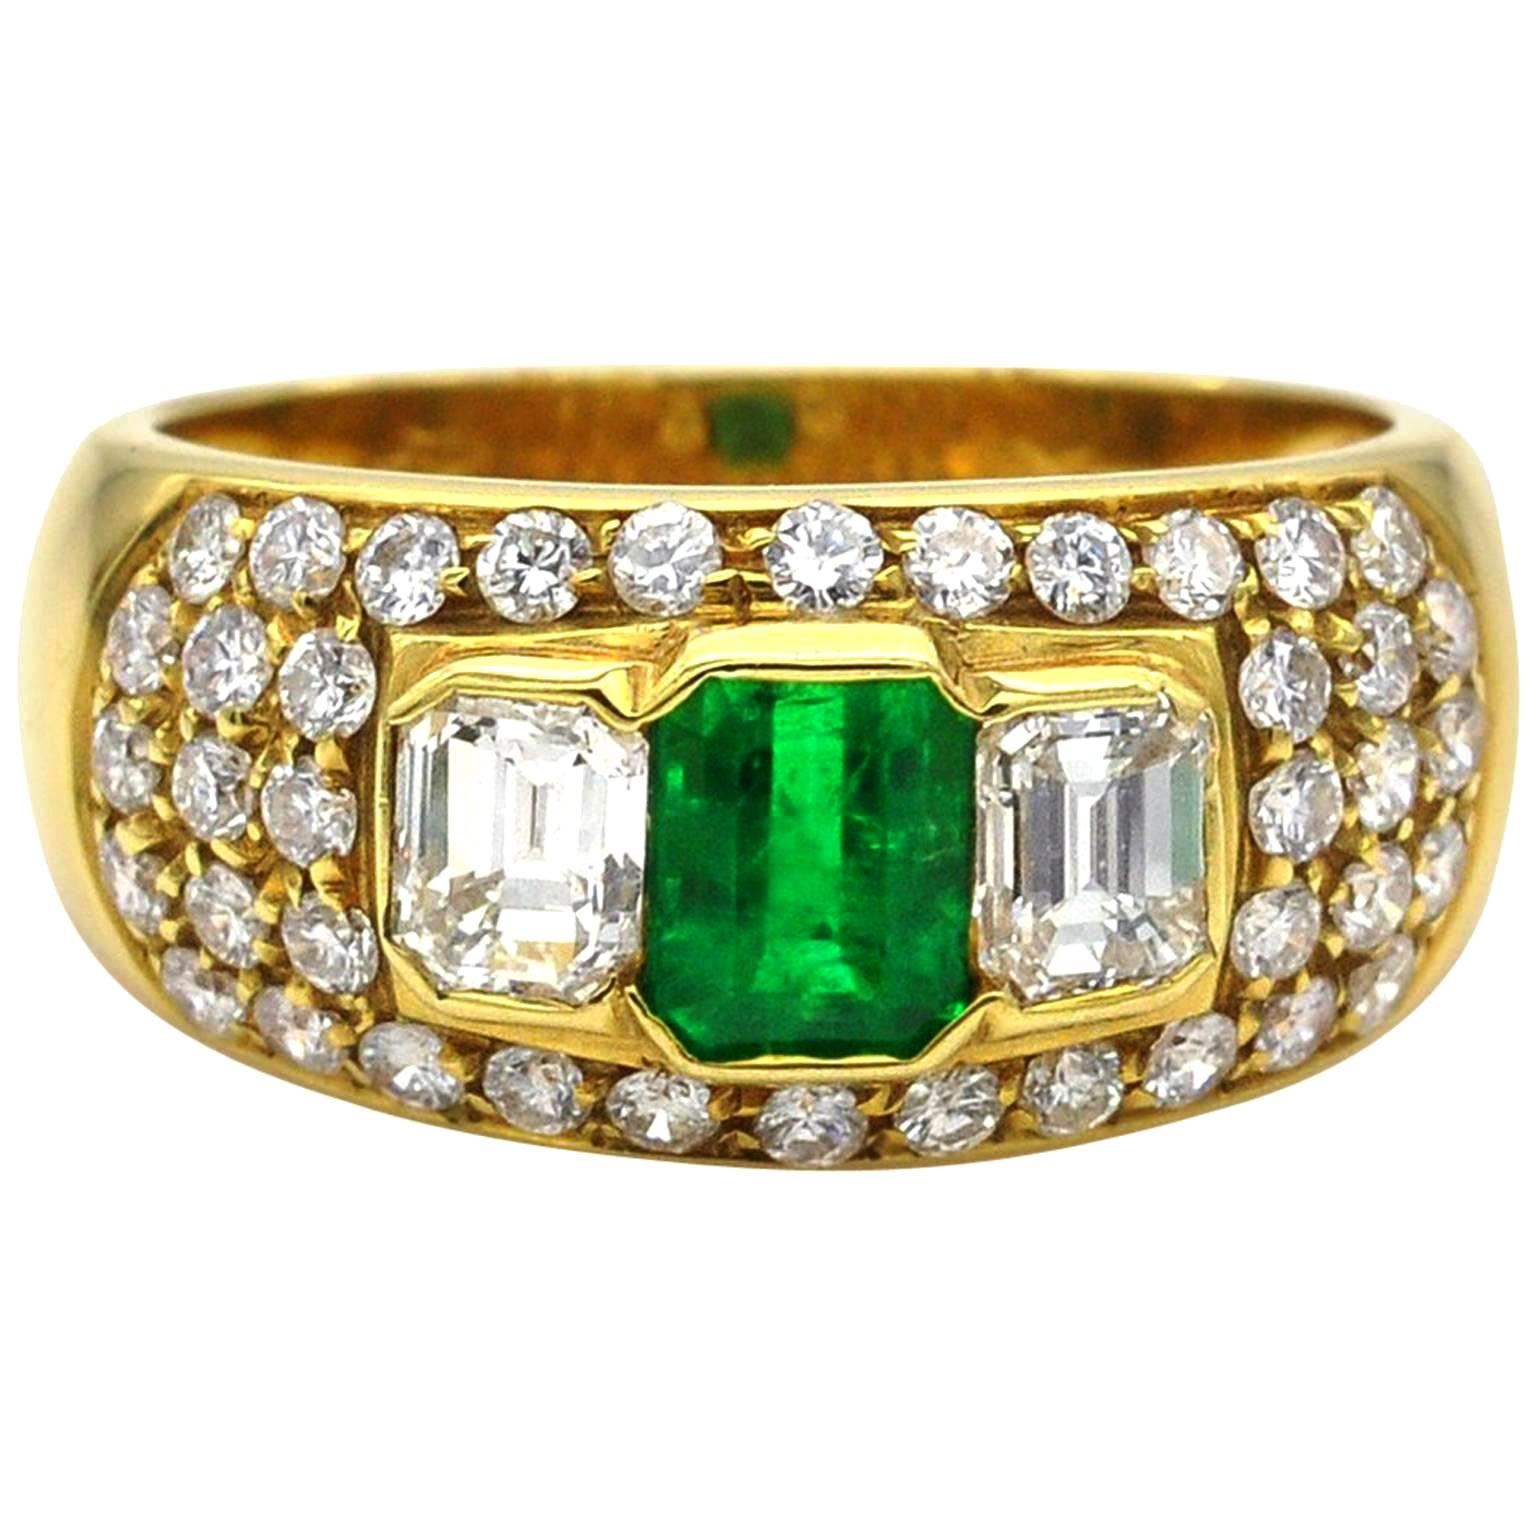 Emerald and Diamond 18 Karat Yellow Gold Ring